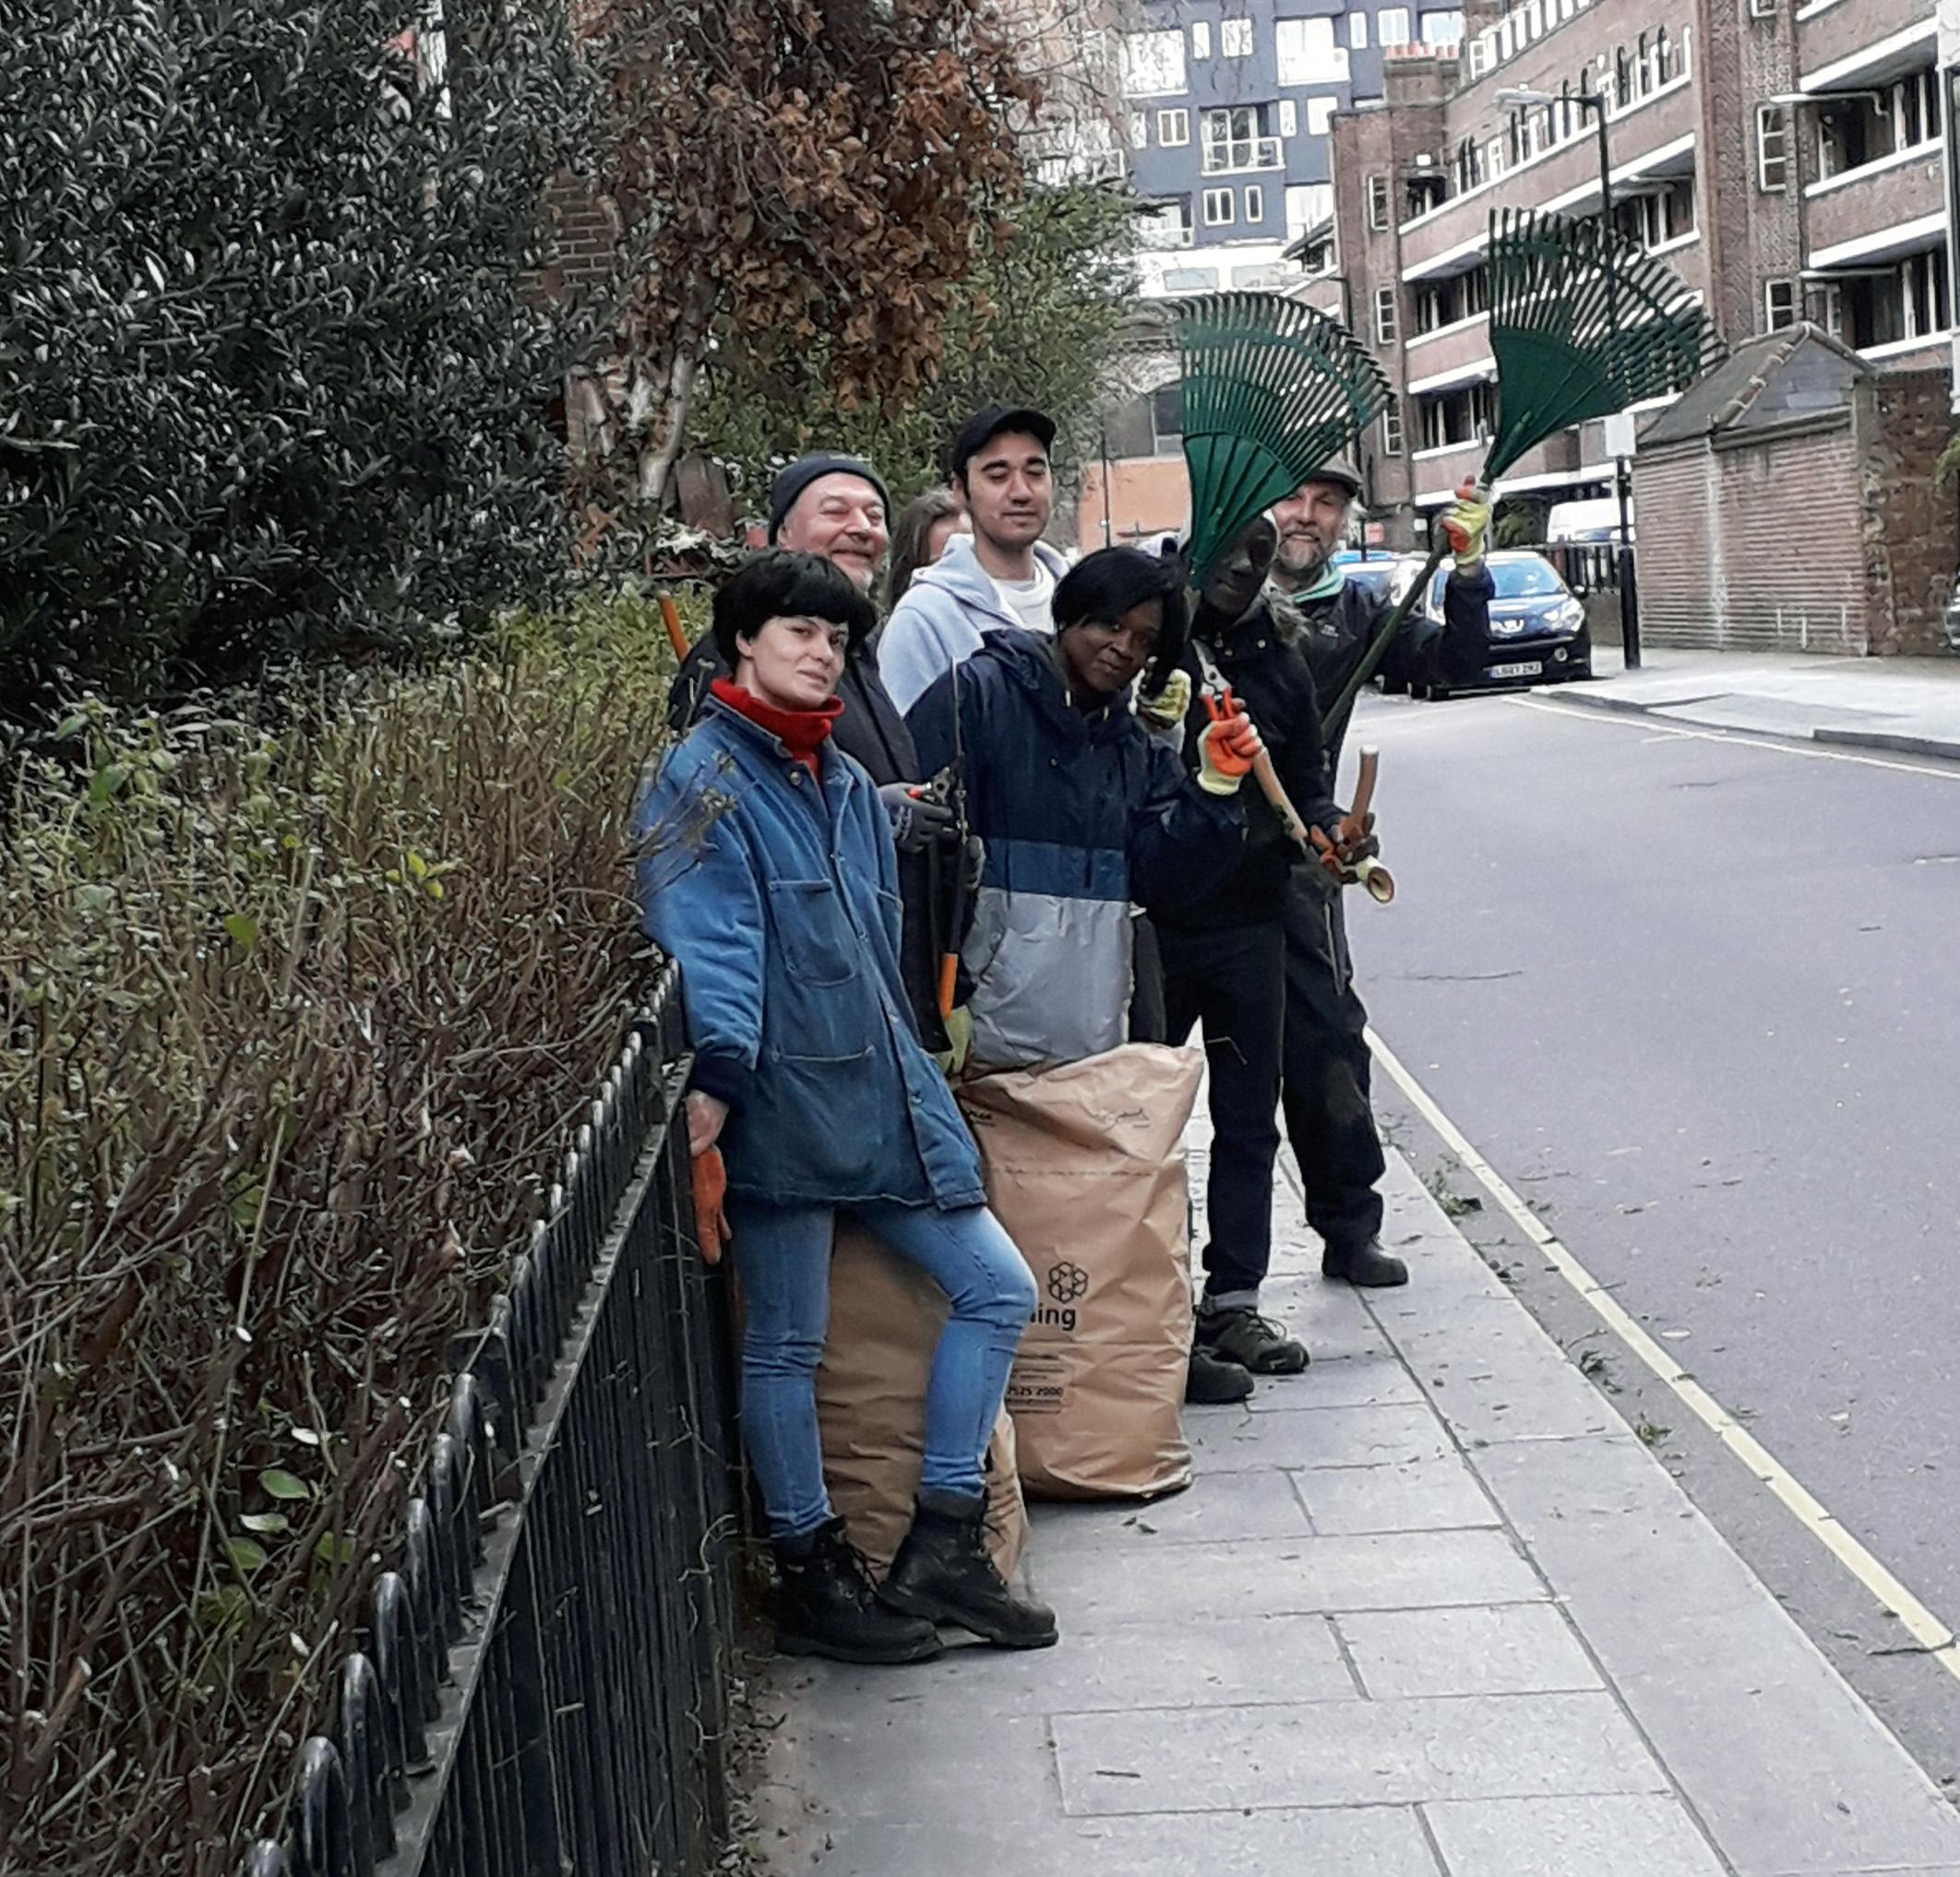 FG6 street planting cropped.jpg